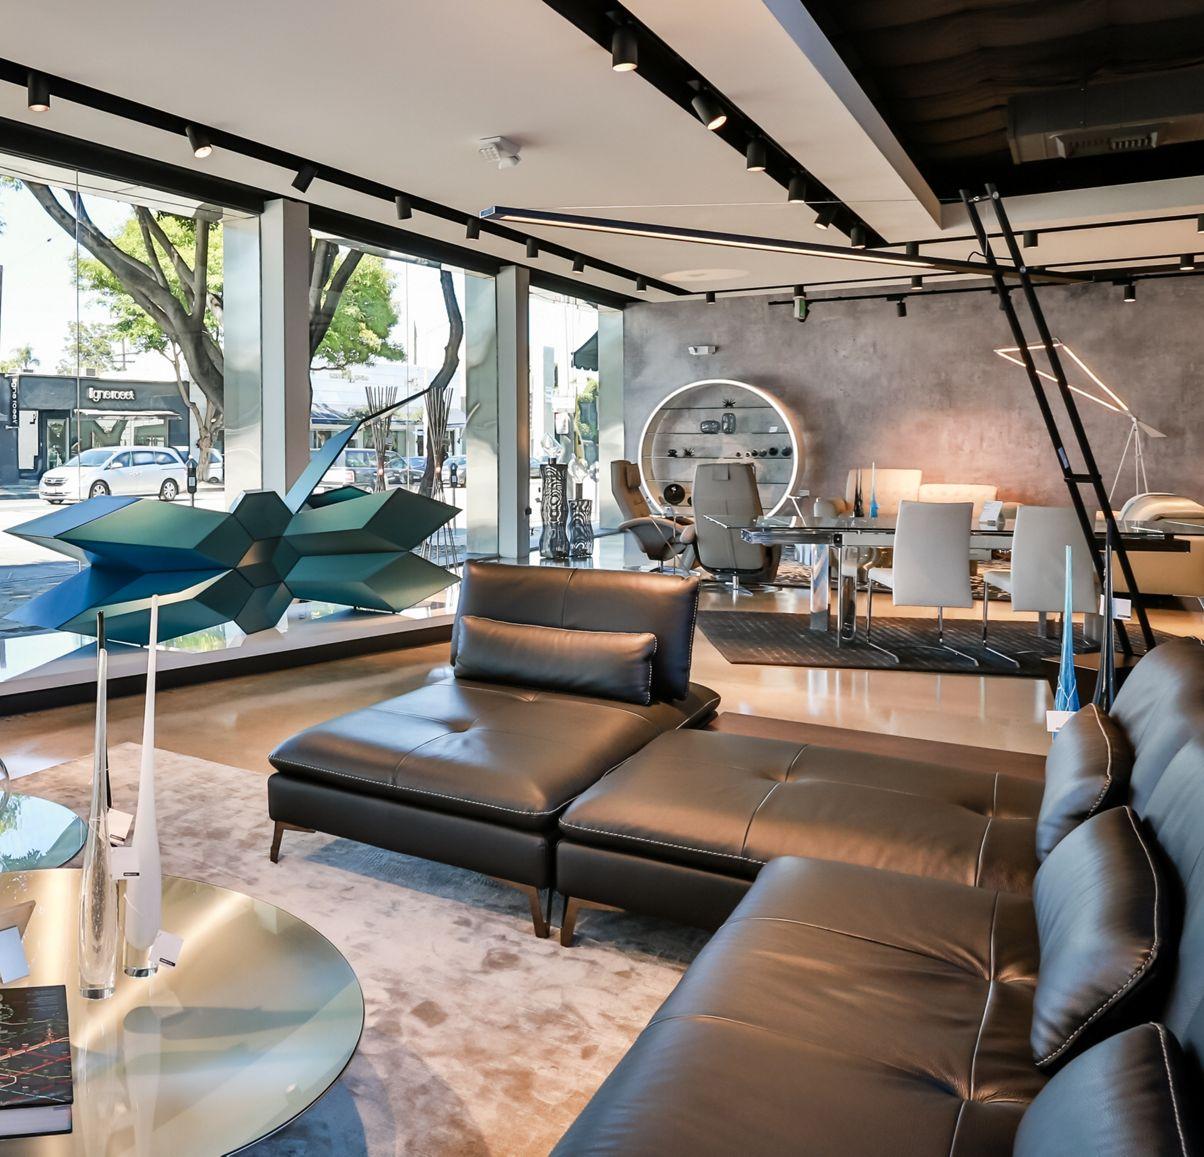 Roche Bobois Showroom CA - Los Angeles (CA 90048)